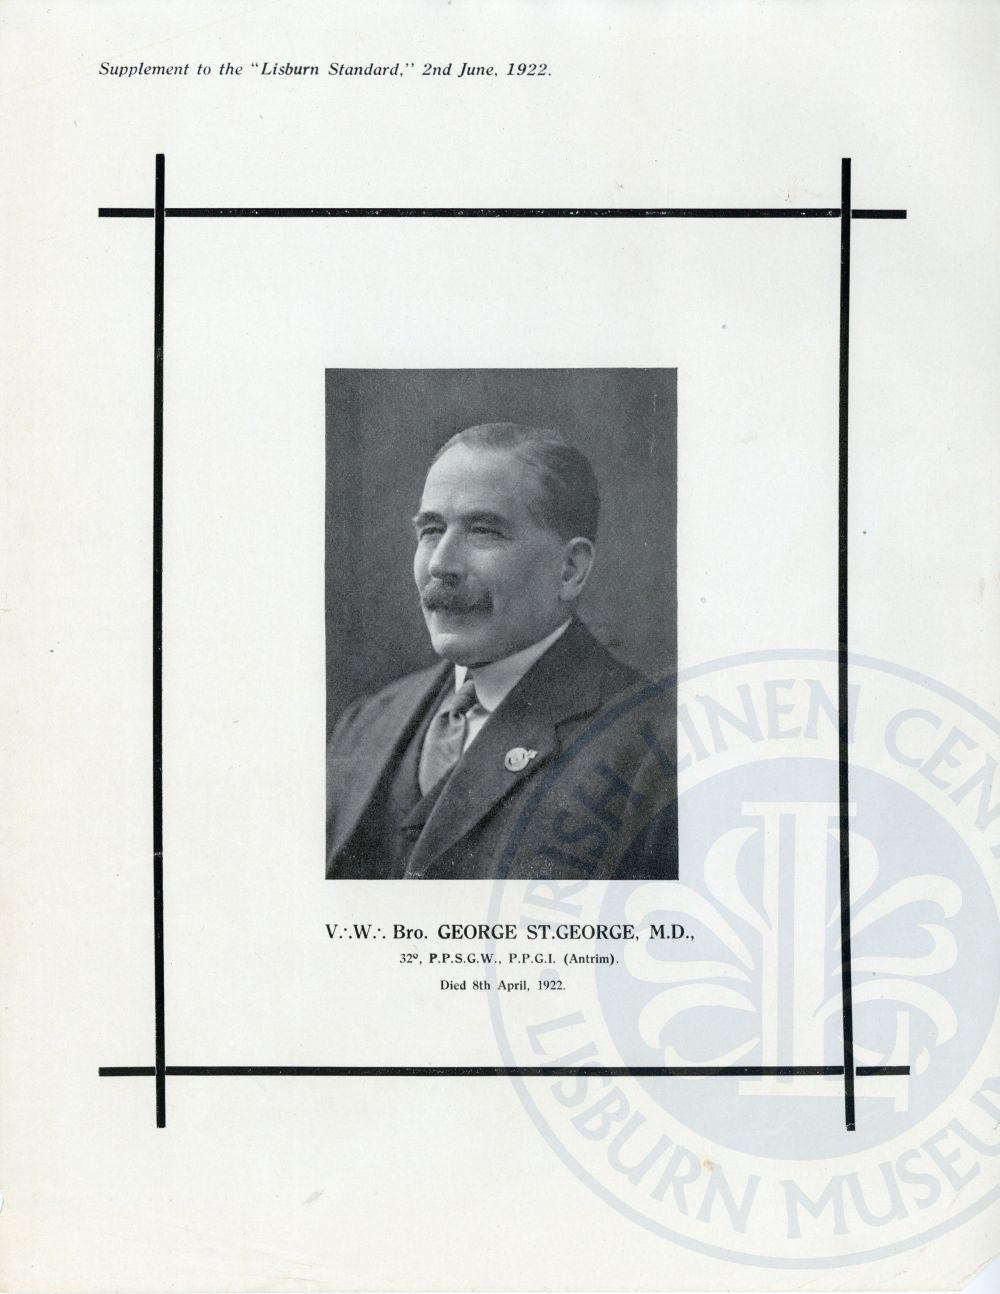 Dr George St. George, Lisburn Standard Supplement - ILC&LM Collection